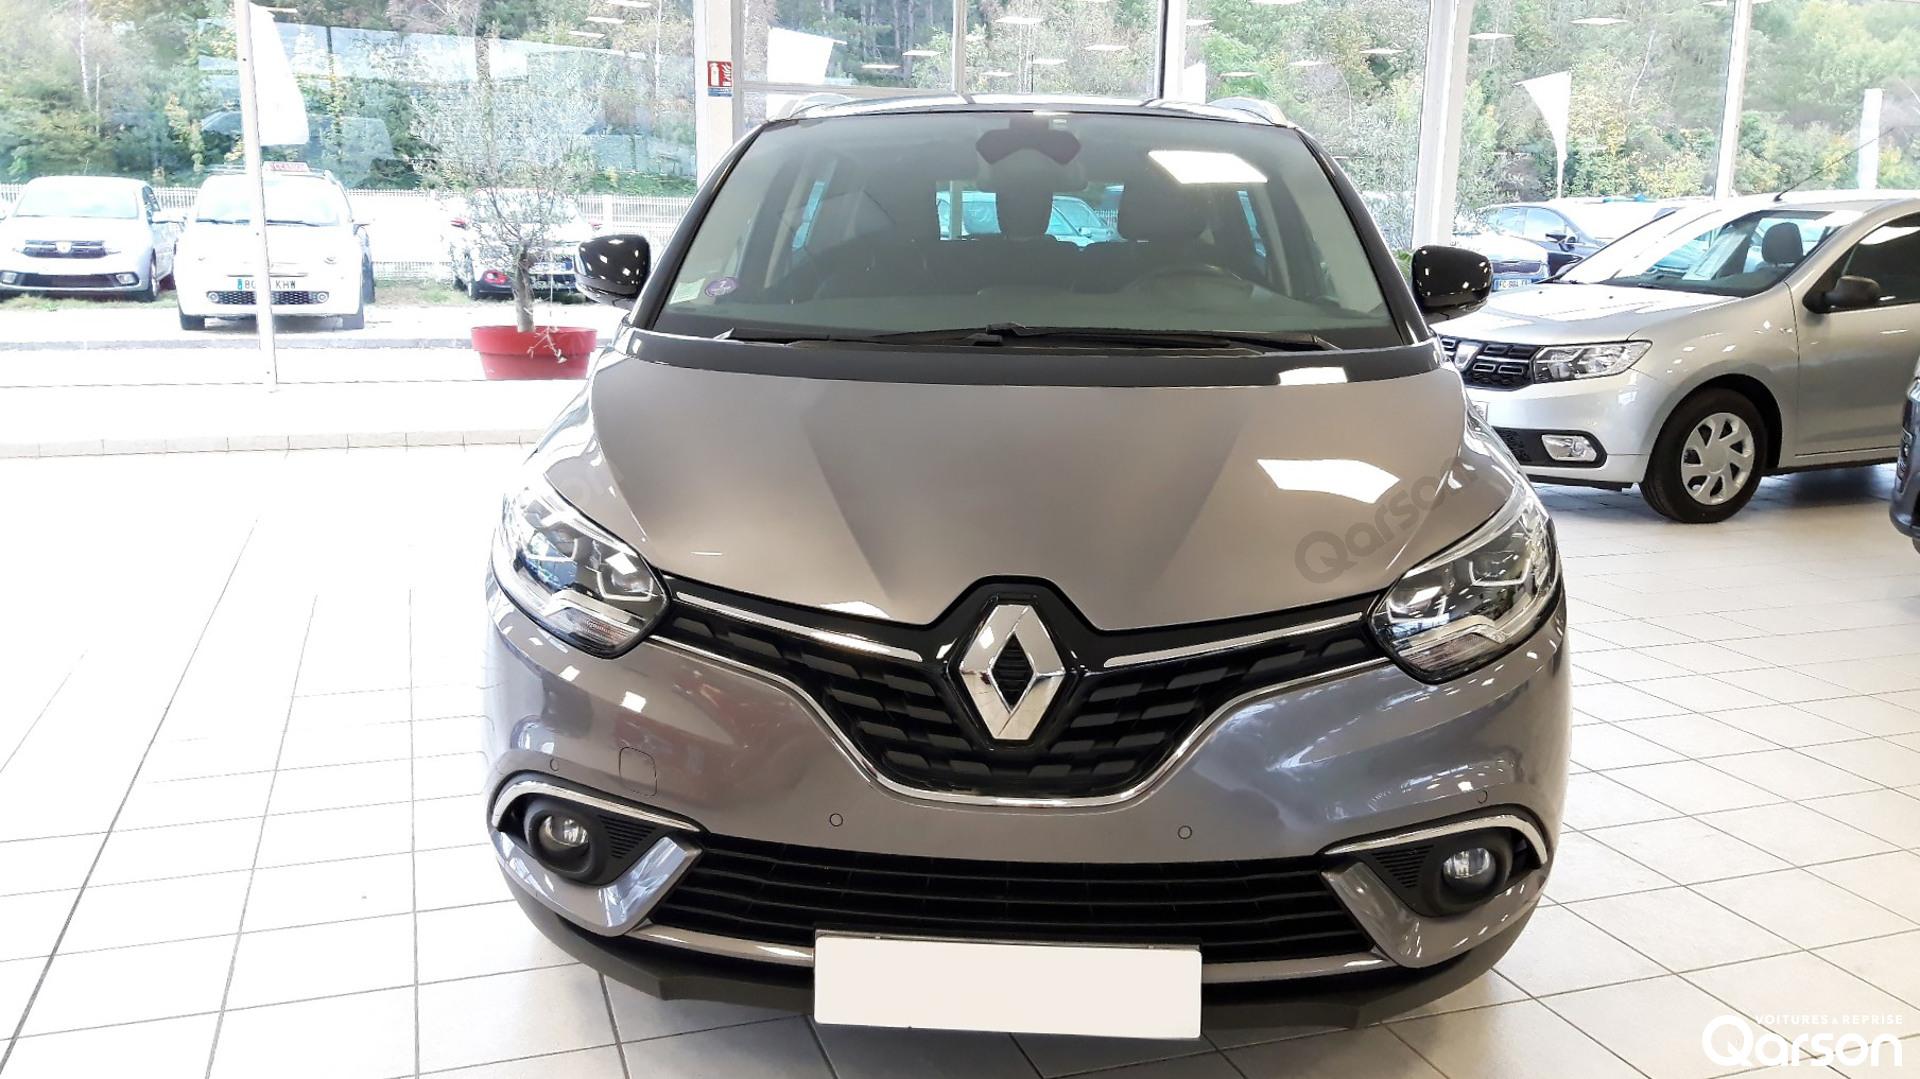 Calandre Renault Scenic GRAND